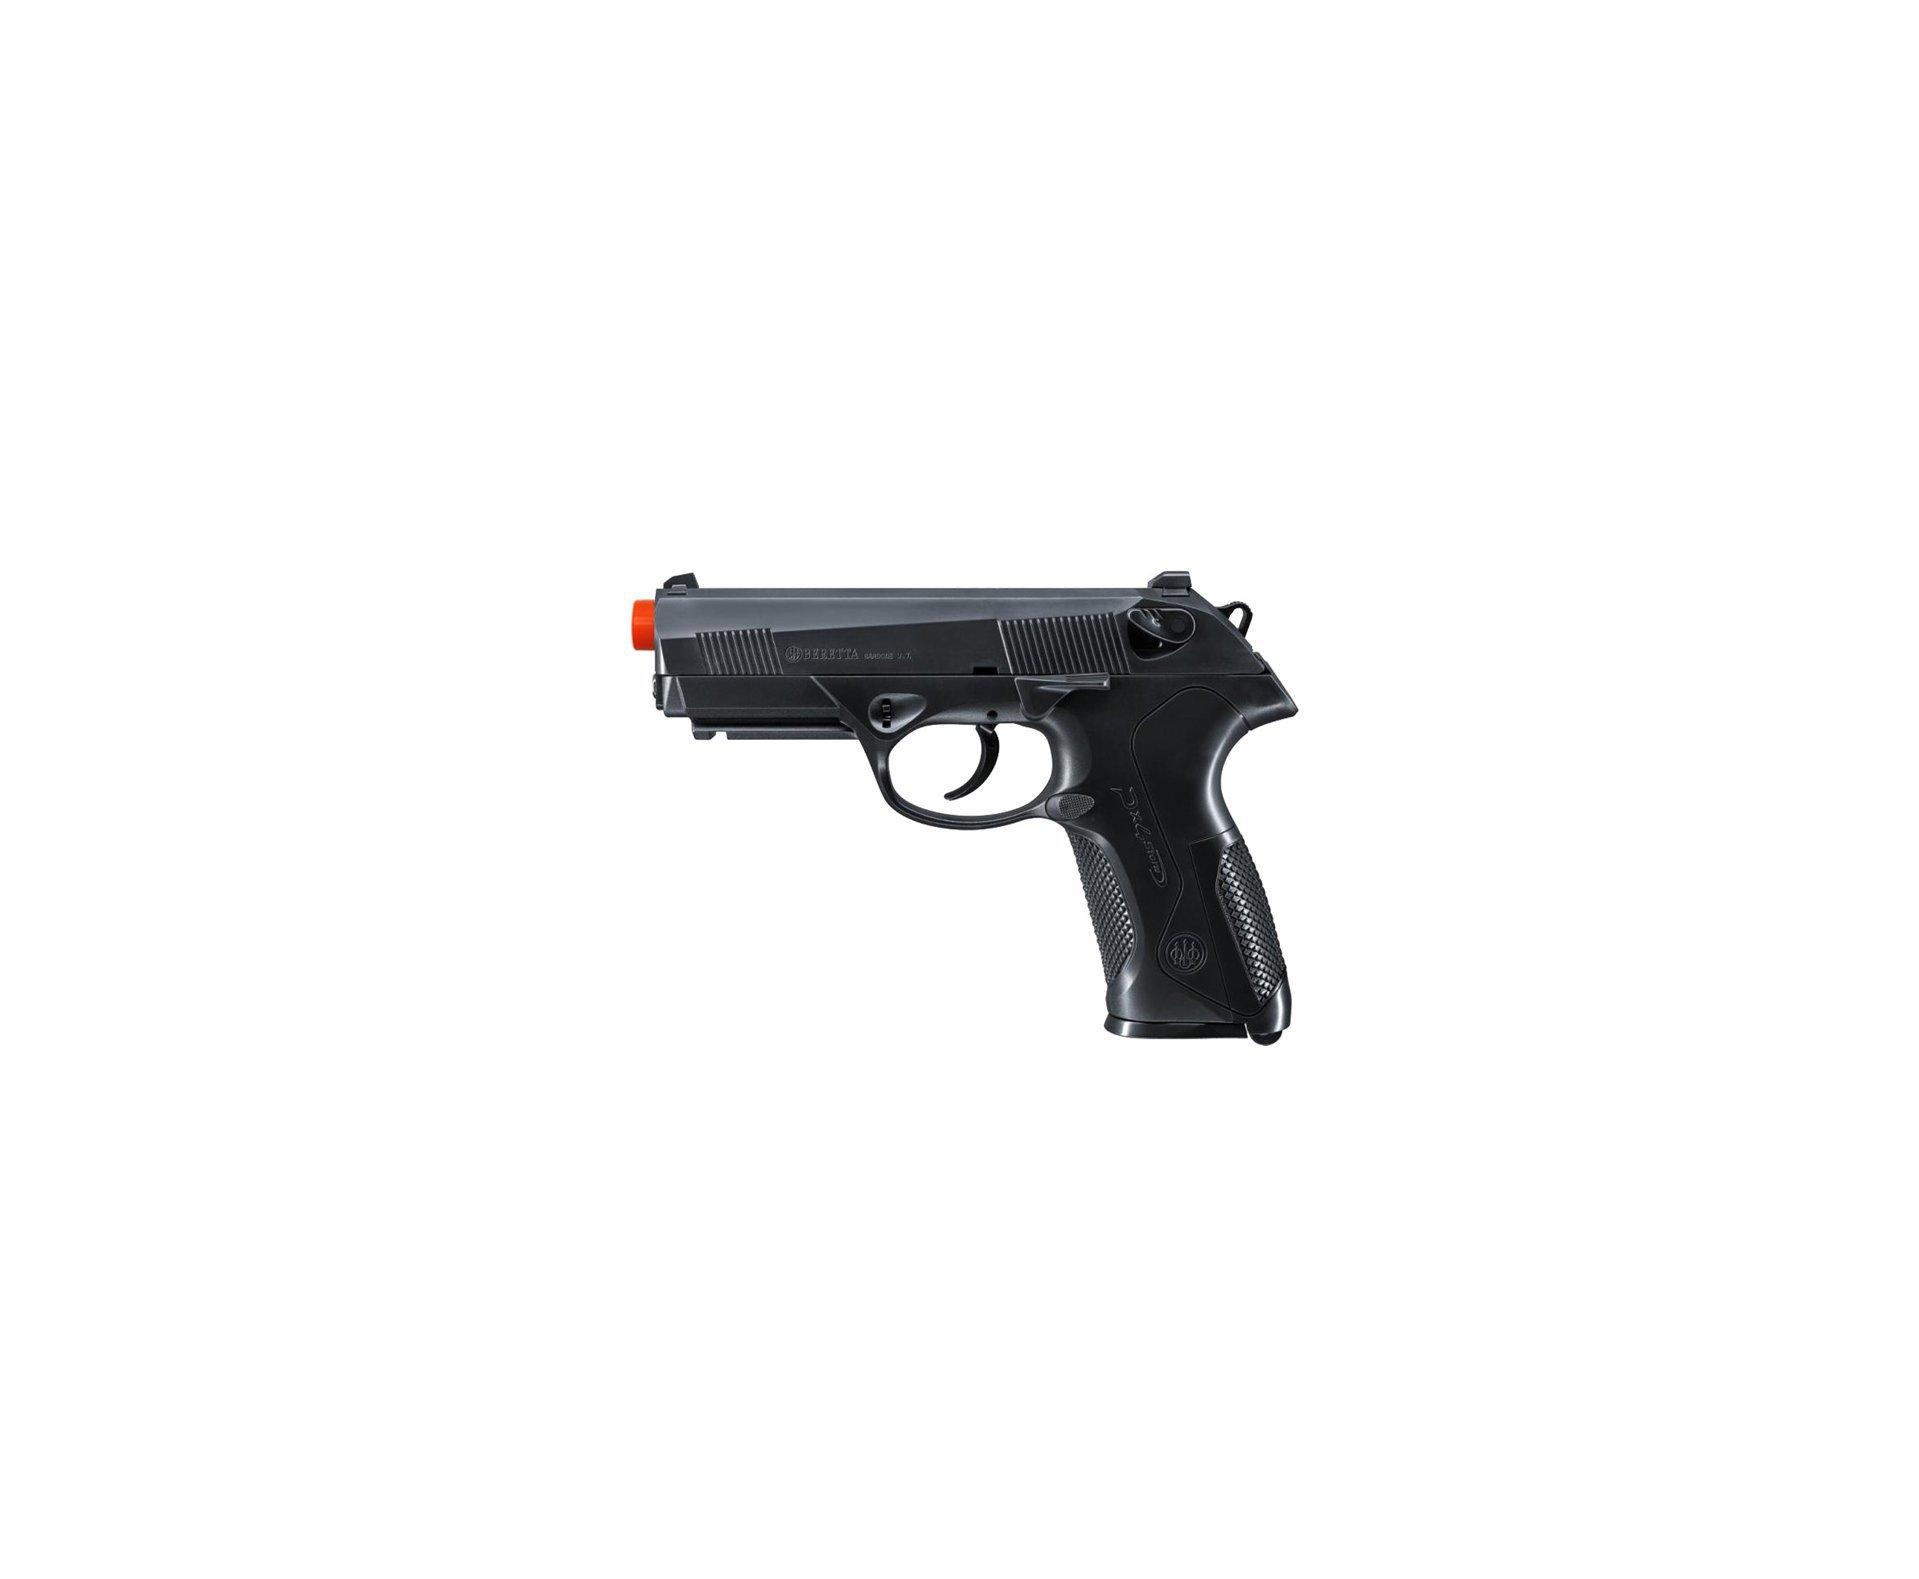 Pistola De Airsoft Beretta Px4 Storm 6.0 + 4000 Esferas 0,12g + Coldre Cintura + Case Deluxe - Umarex